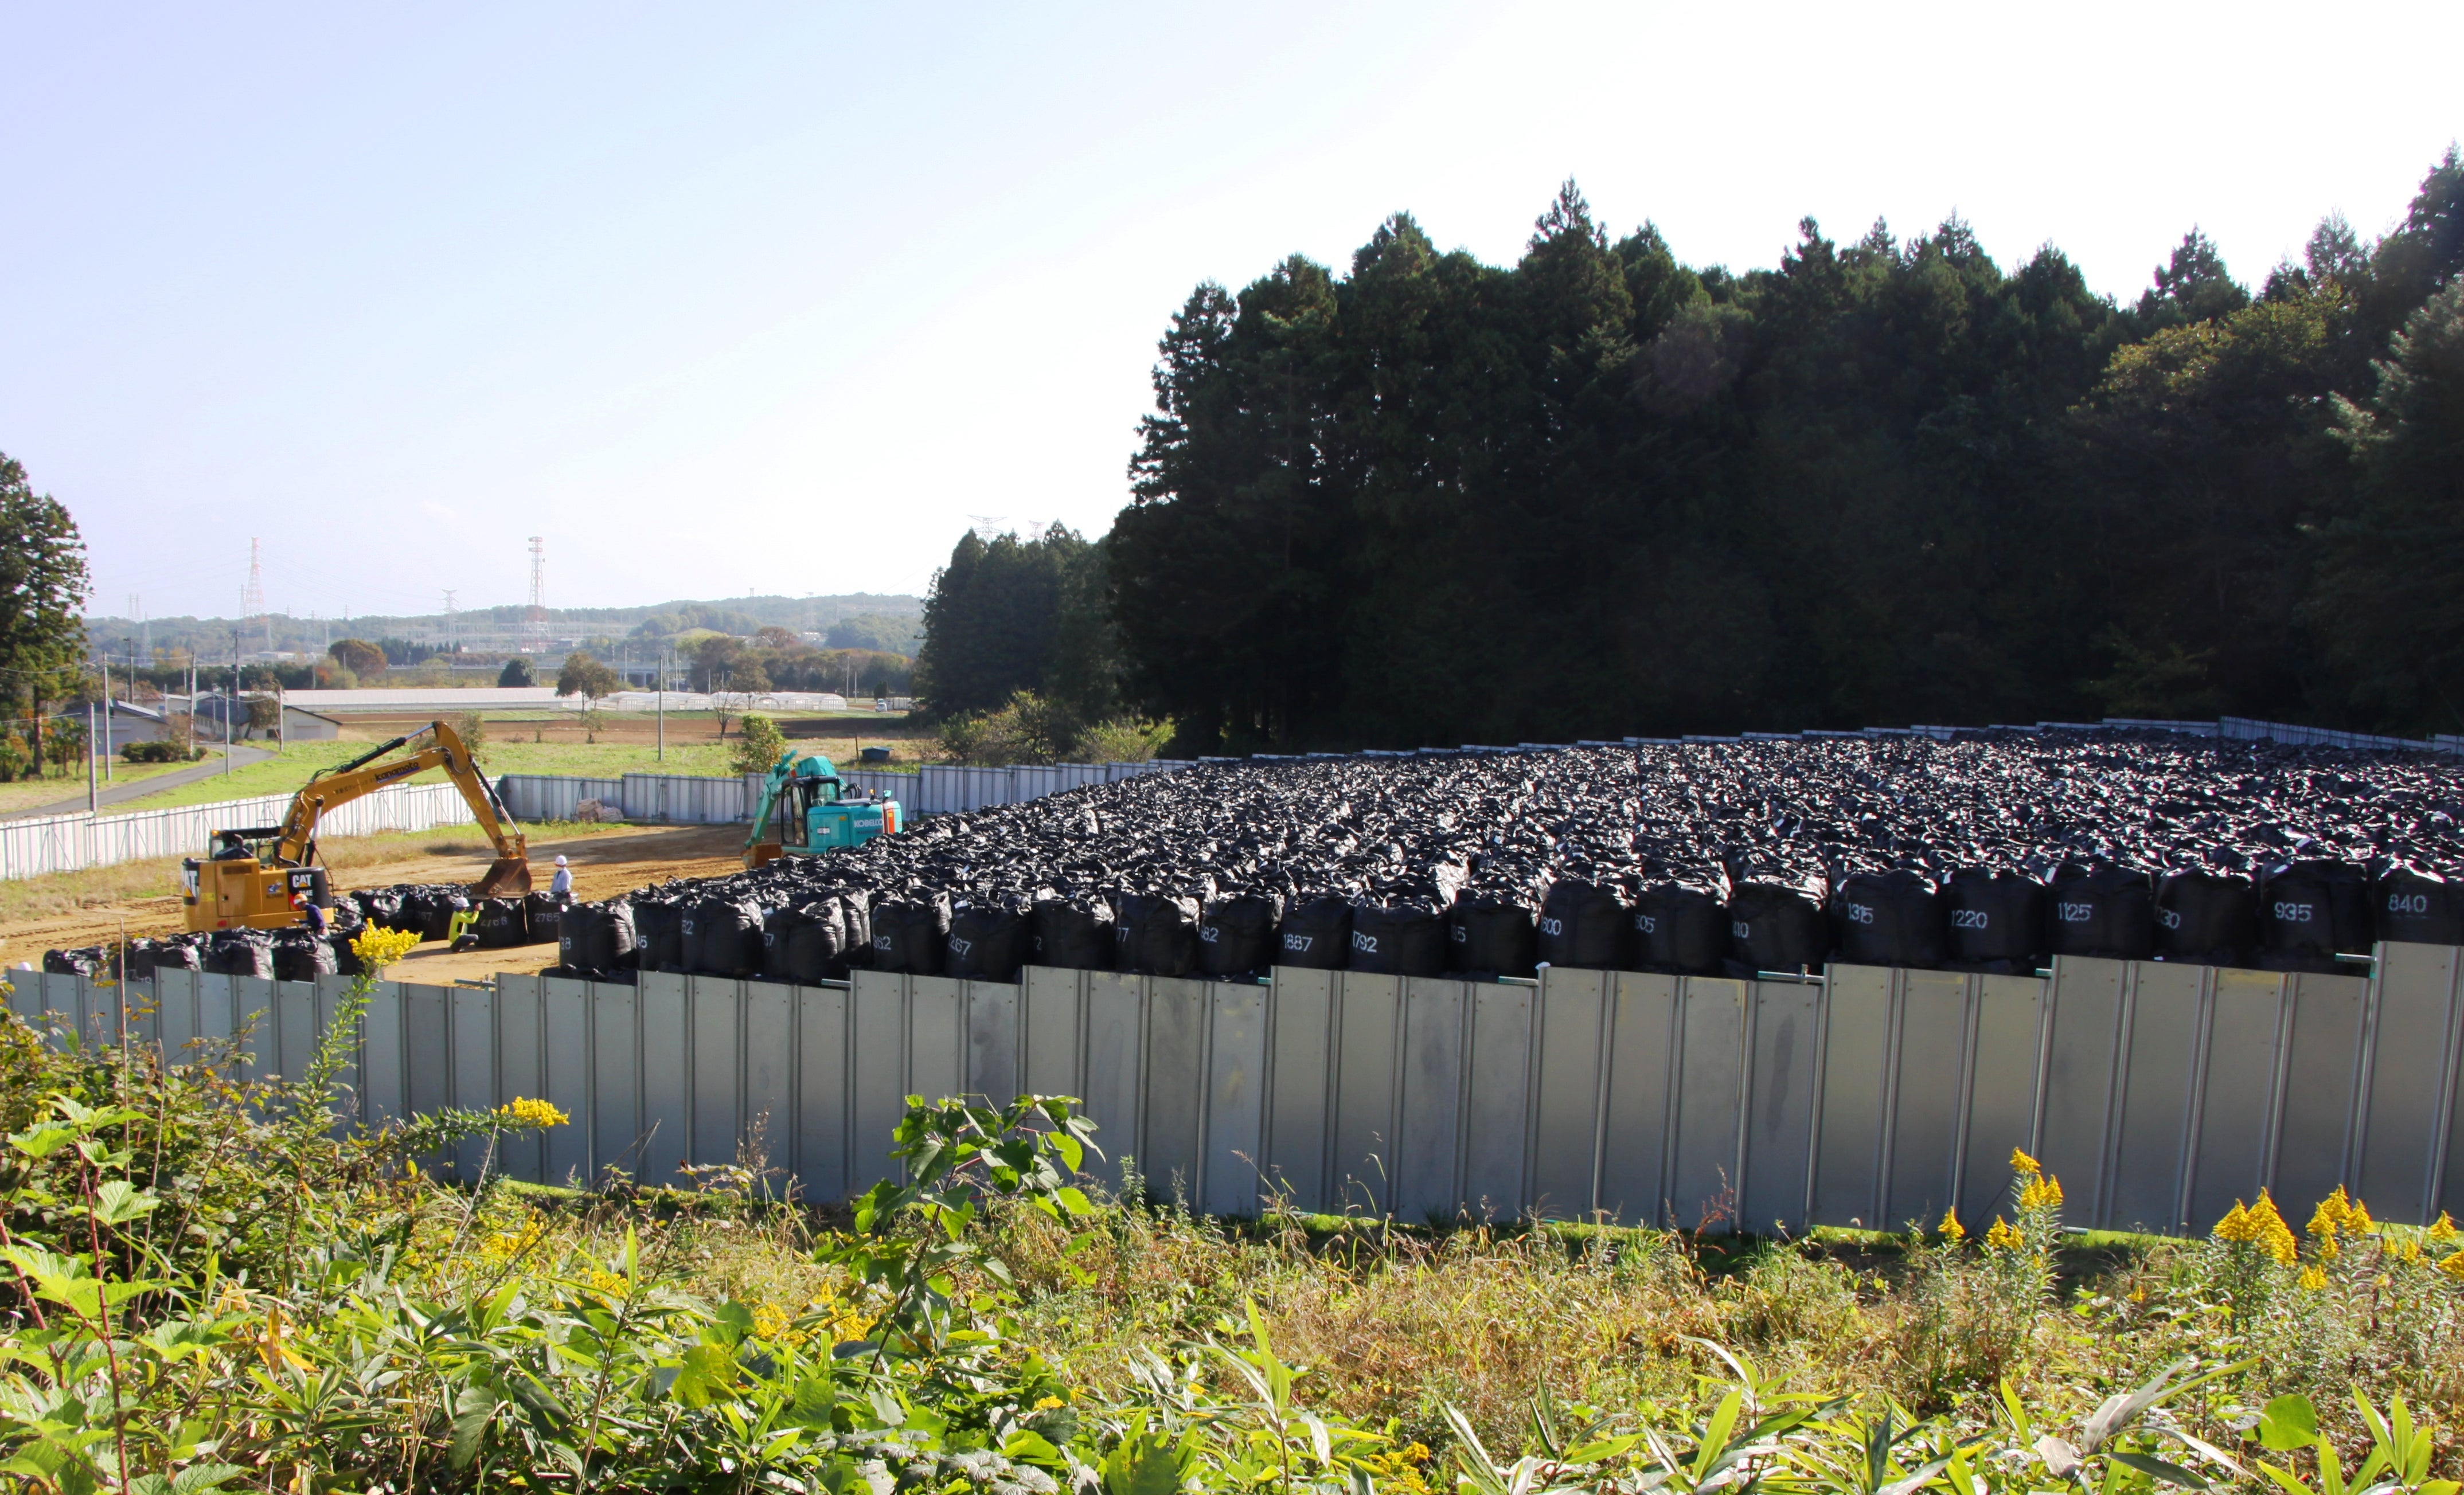 Fukushima Residents Return Despite Radiation - Scientific